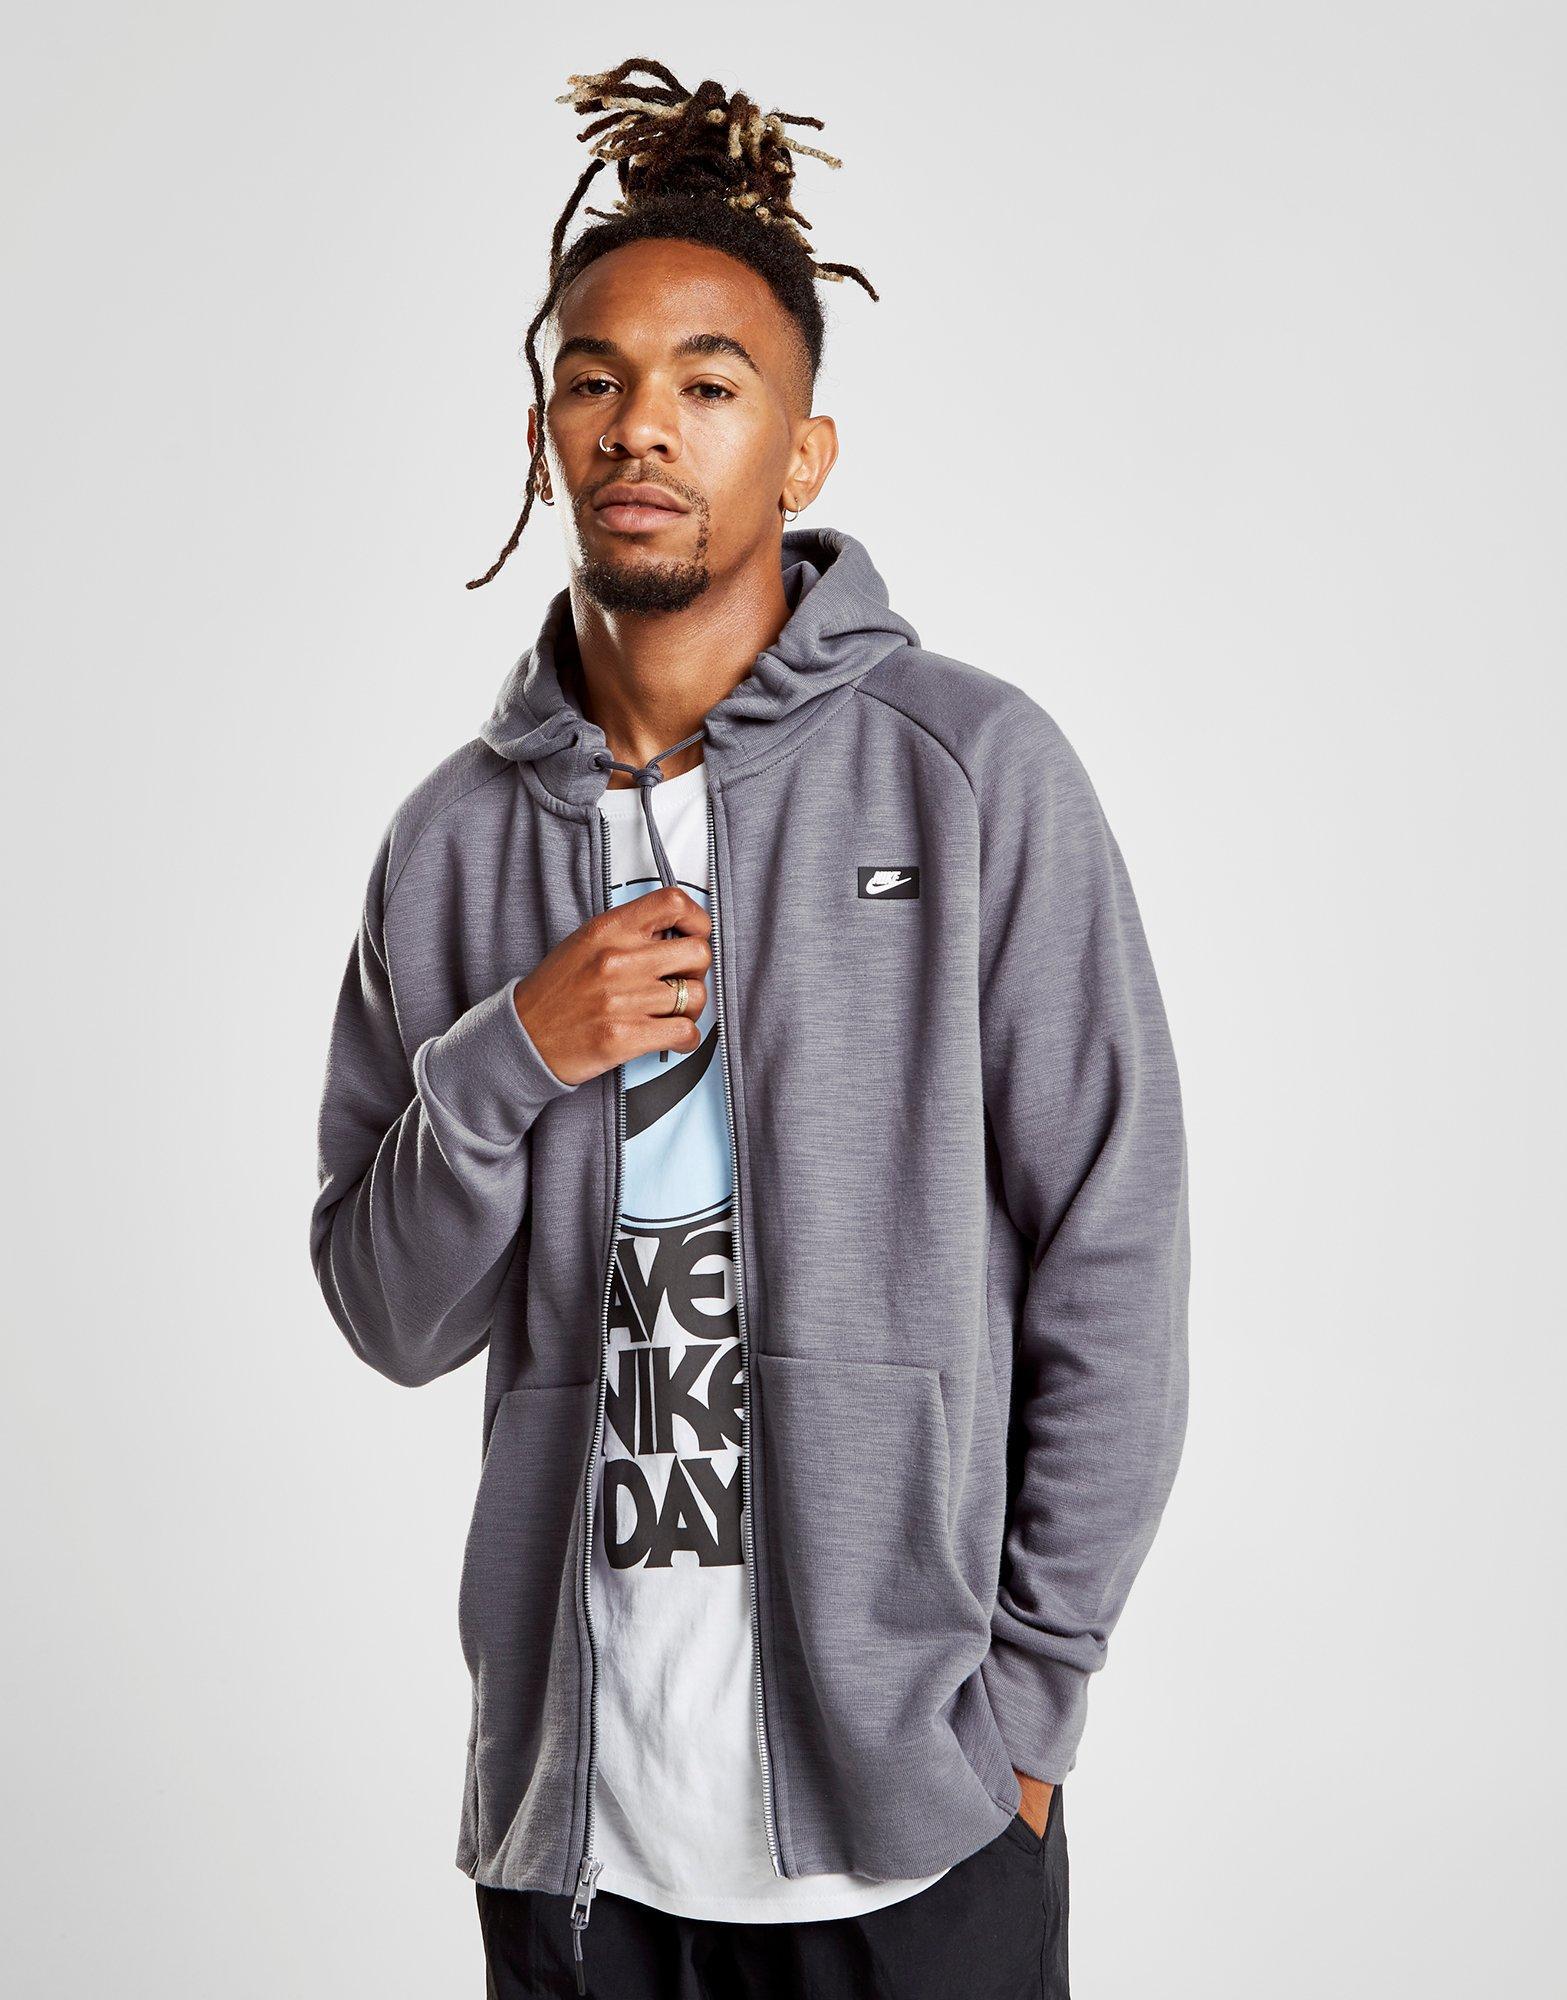 cbb4fc51f7a7 Nike Optic Full Zip Hoodie in Gray for Men - Lyst